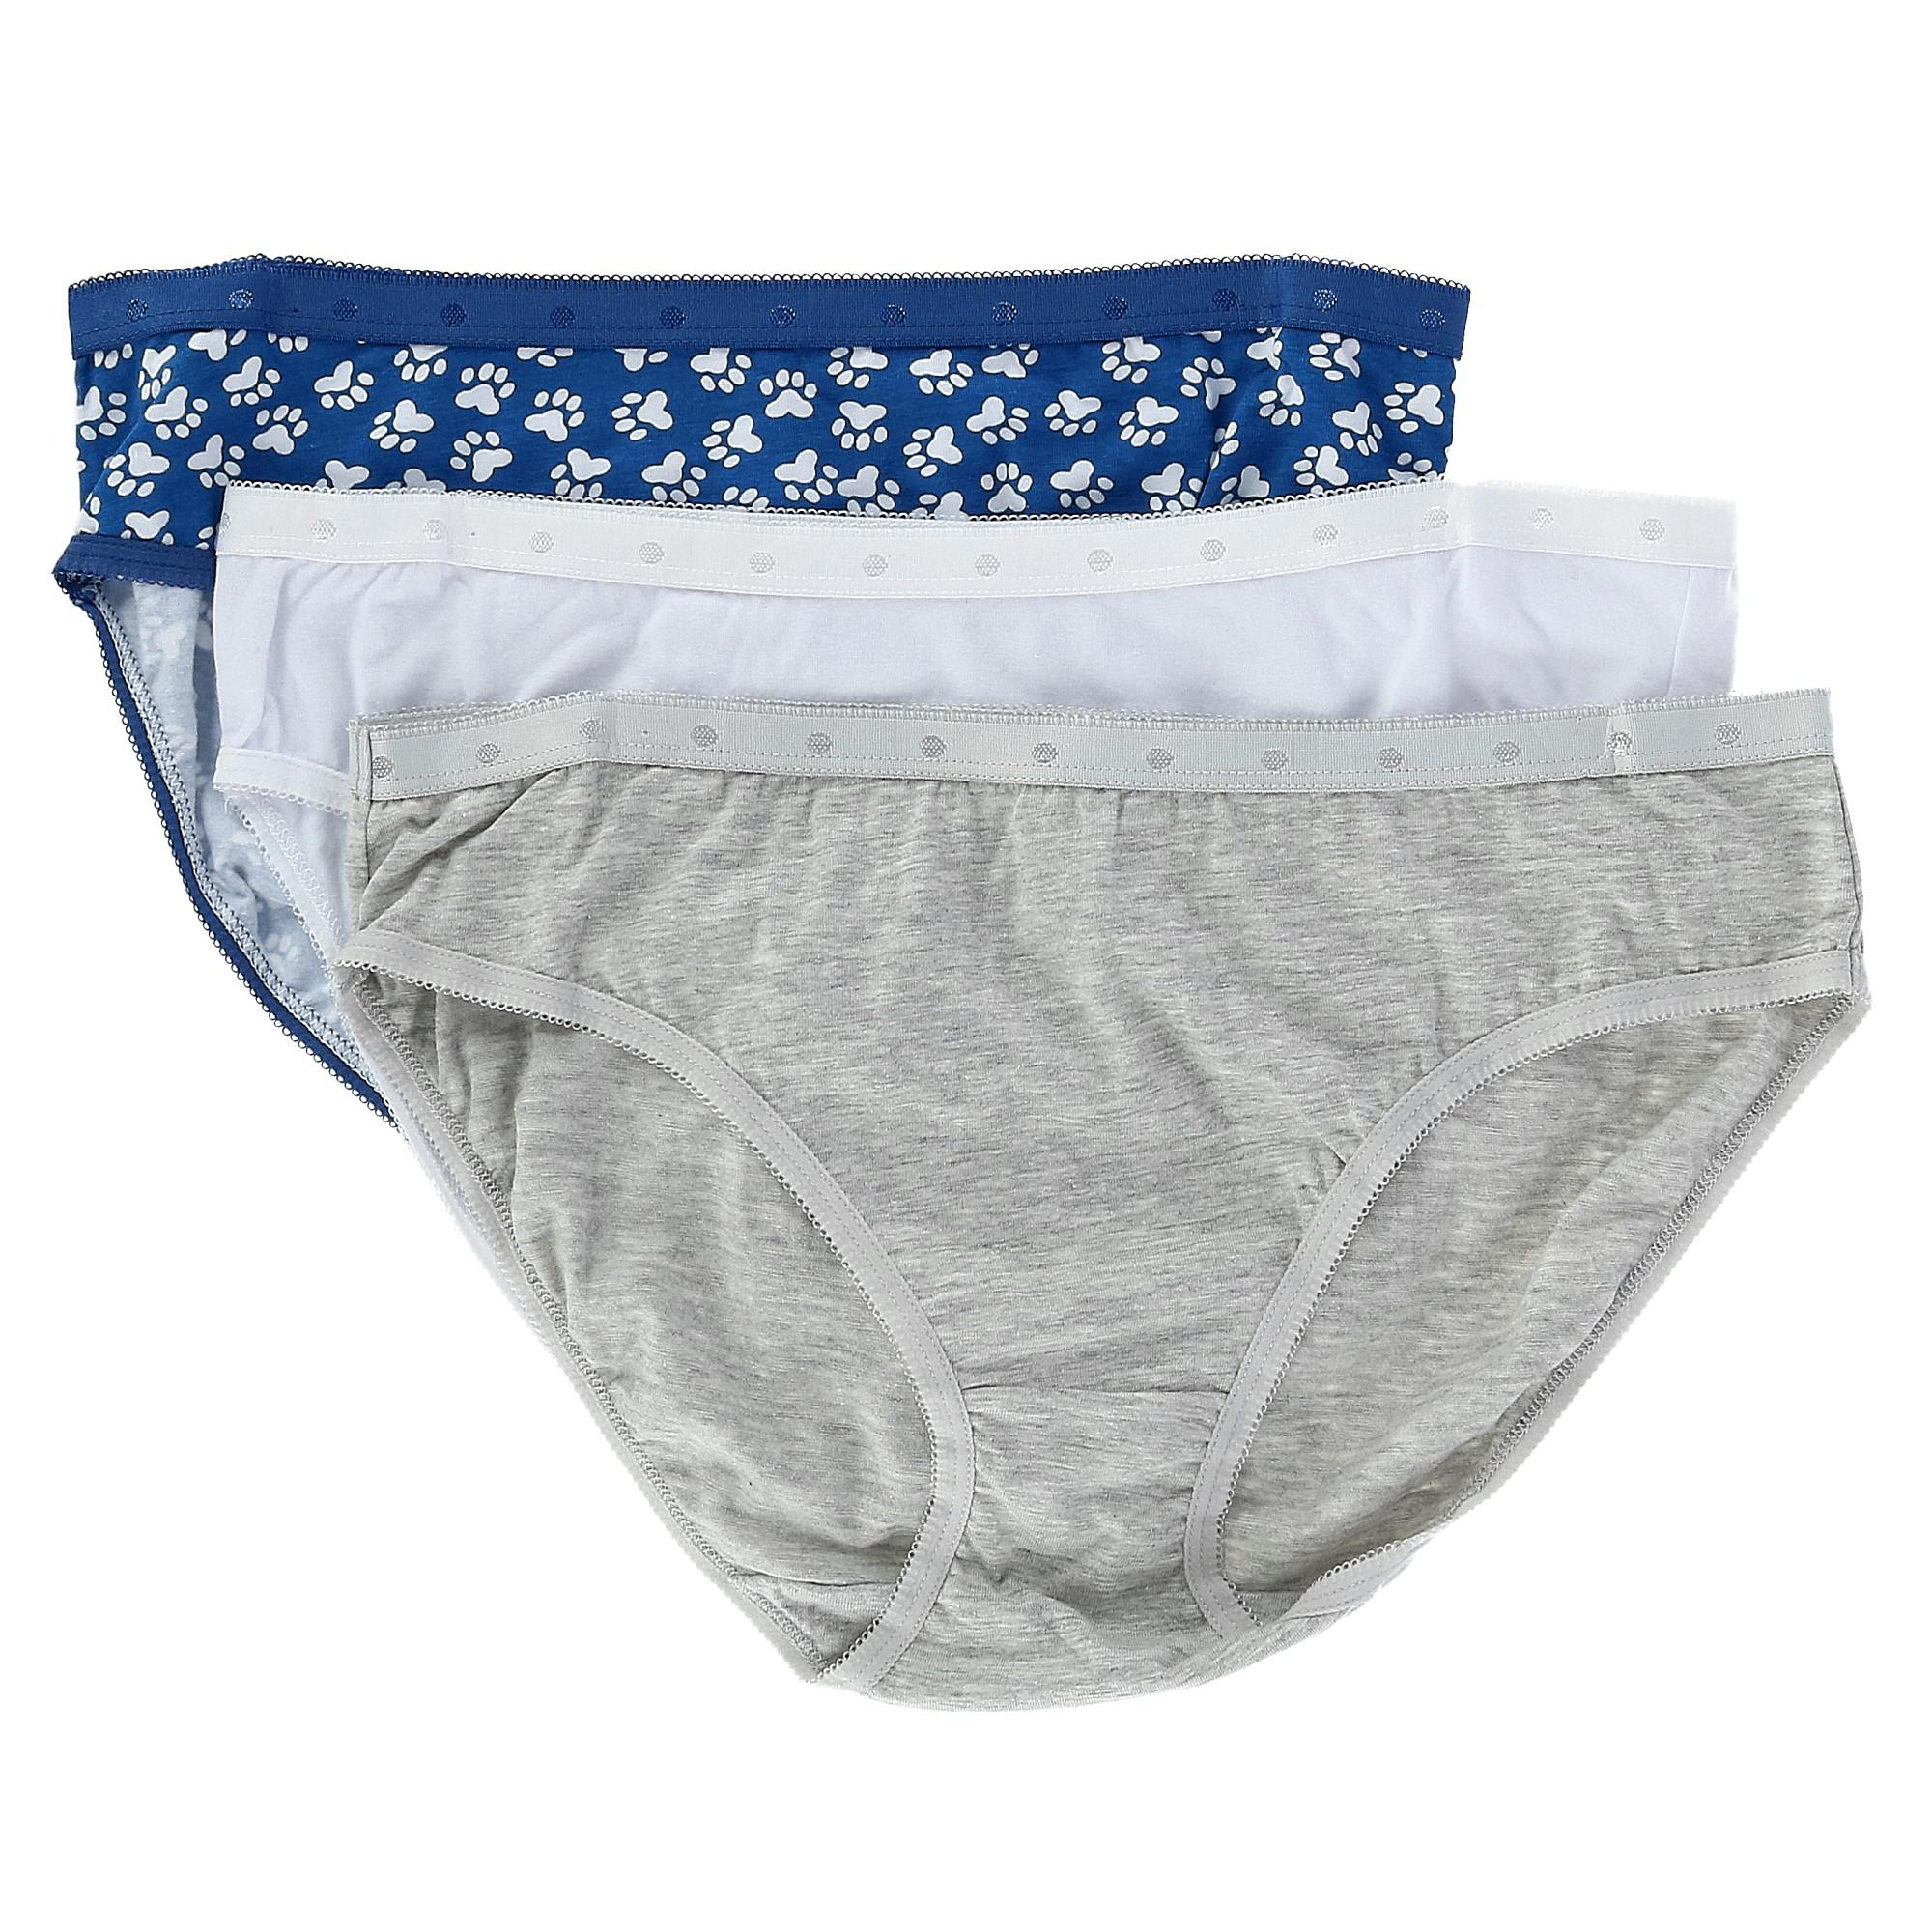 e6f240c0d59 New Rene Rofe Women s Novelty Bikini Underwear (3 Pair Pack)